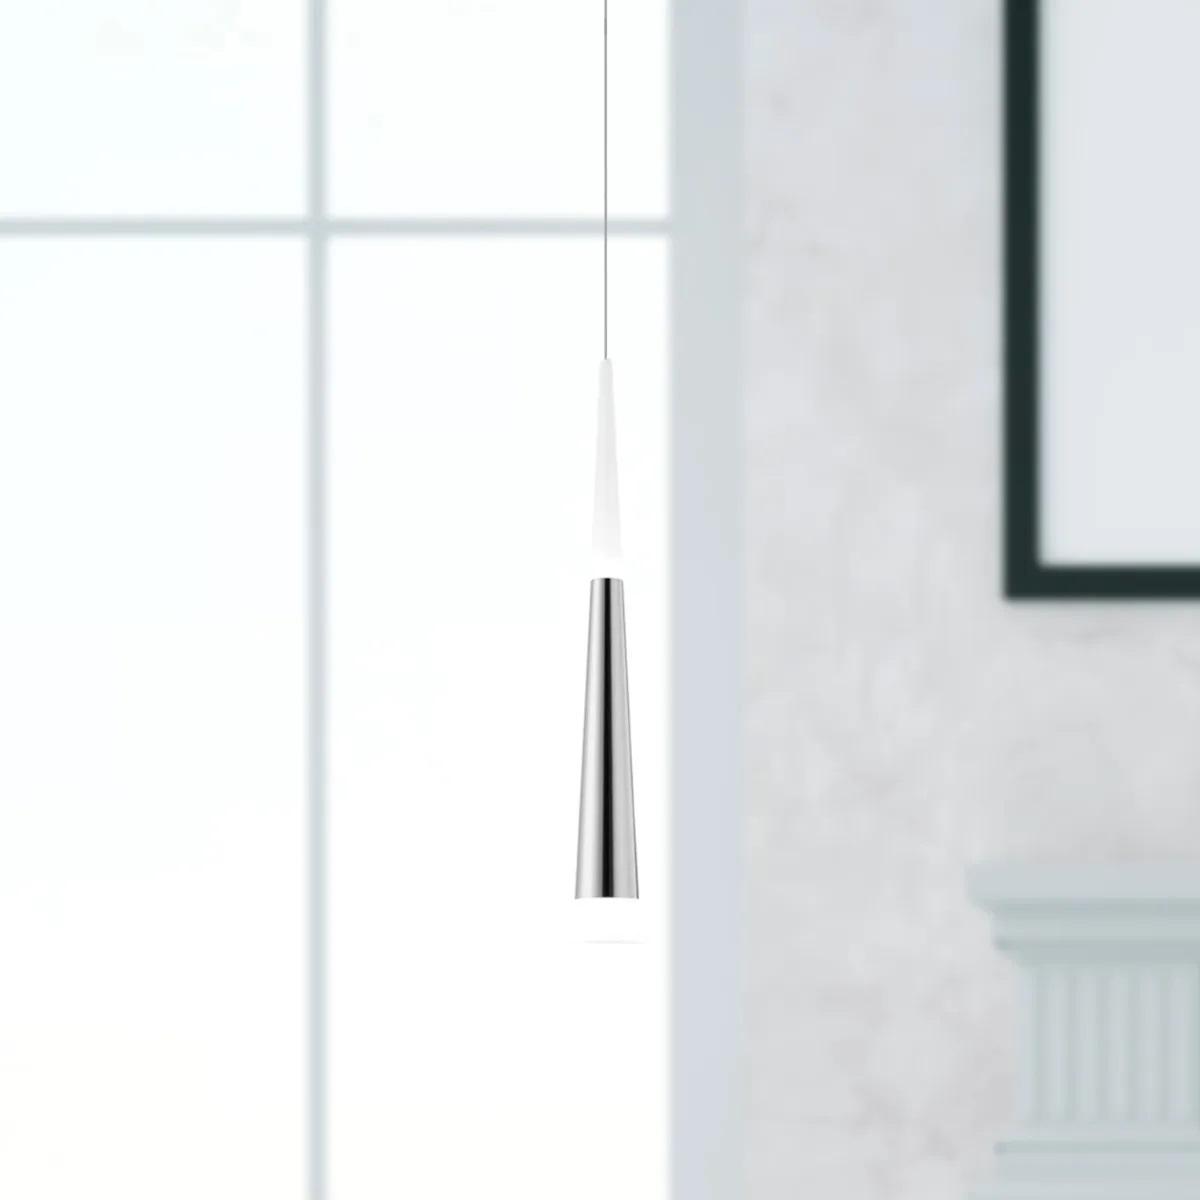 PENDENTE COMER LED 5W 3000K NIQUEL